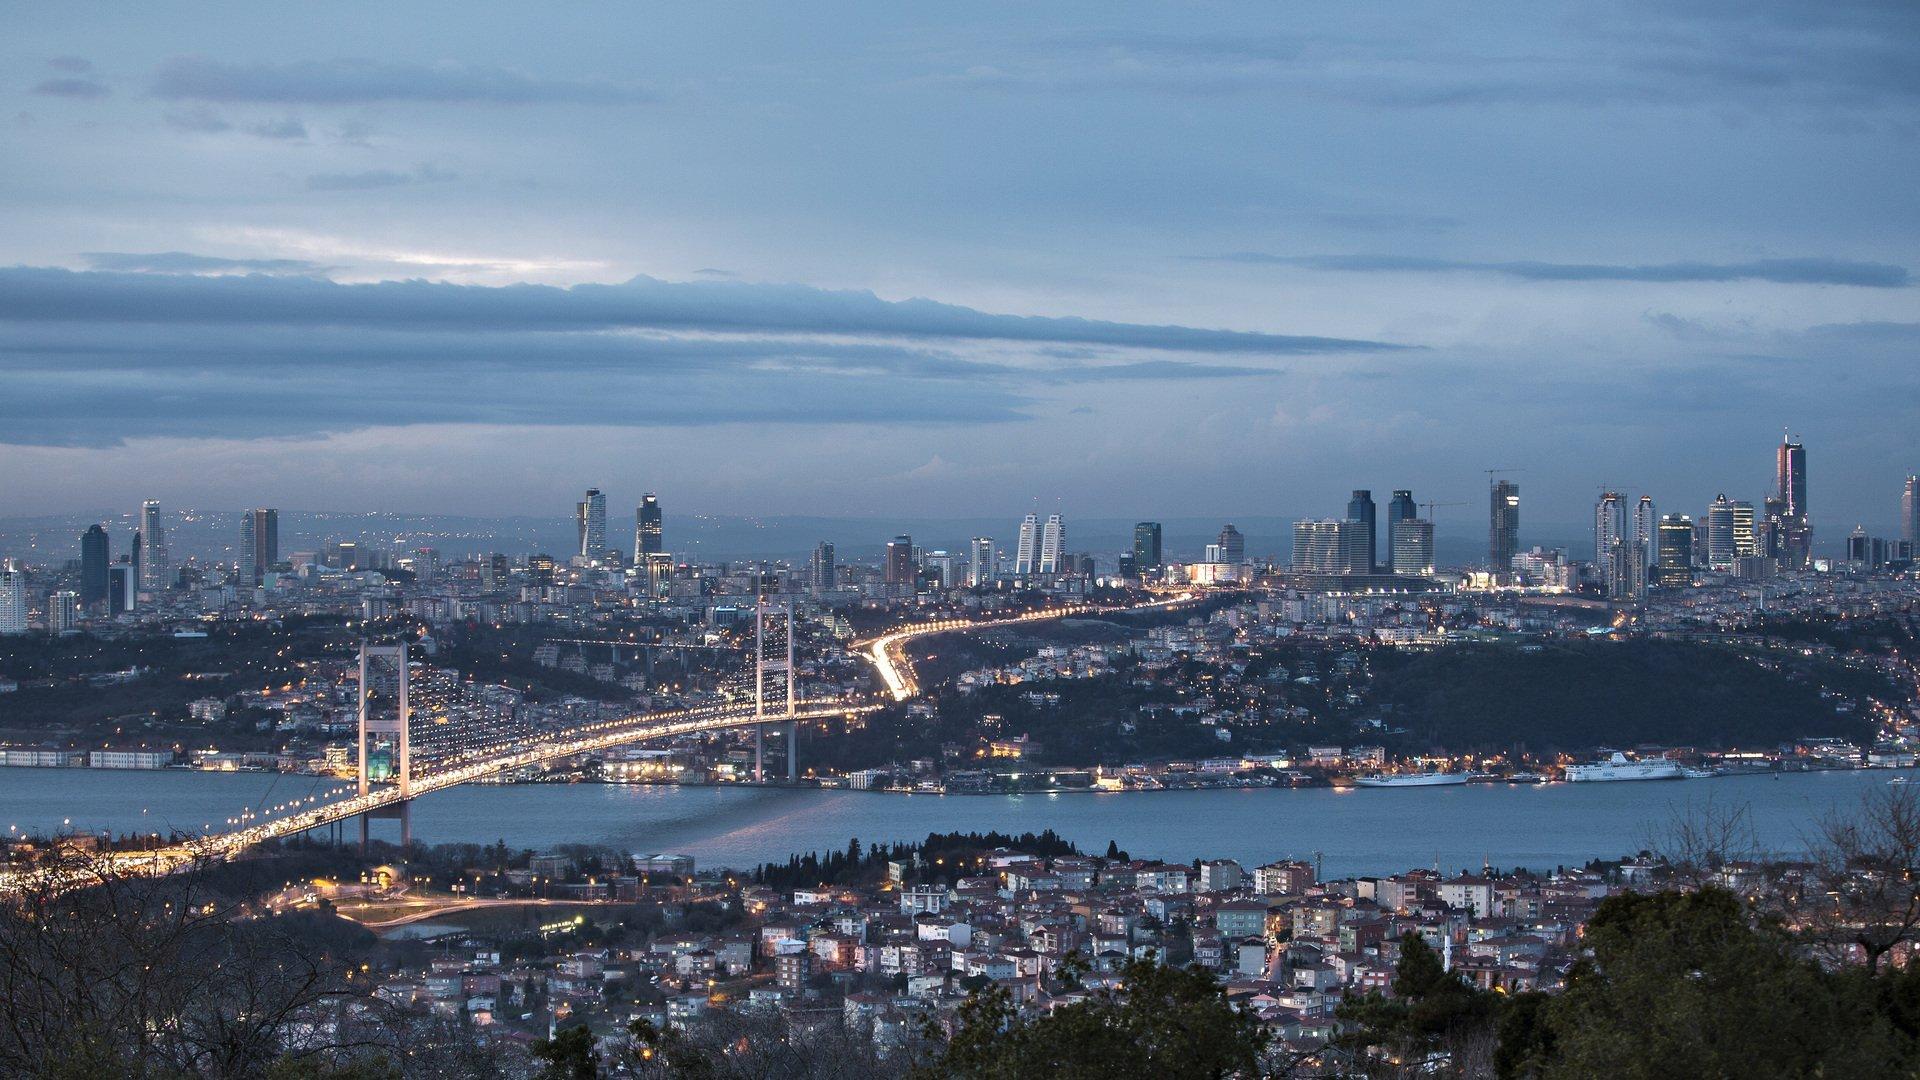 Istanbul wallpaper photo hd